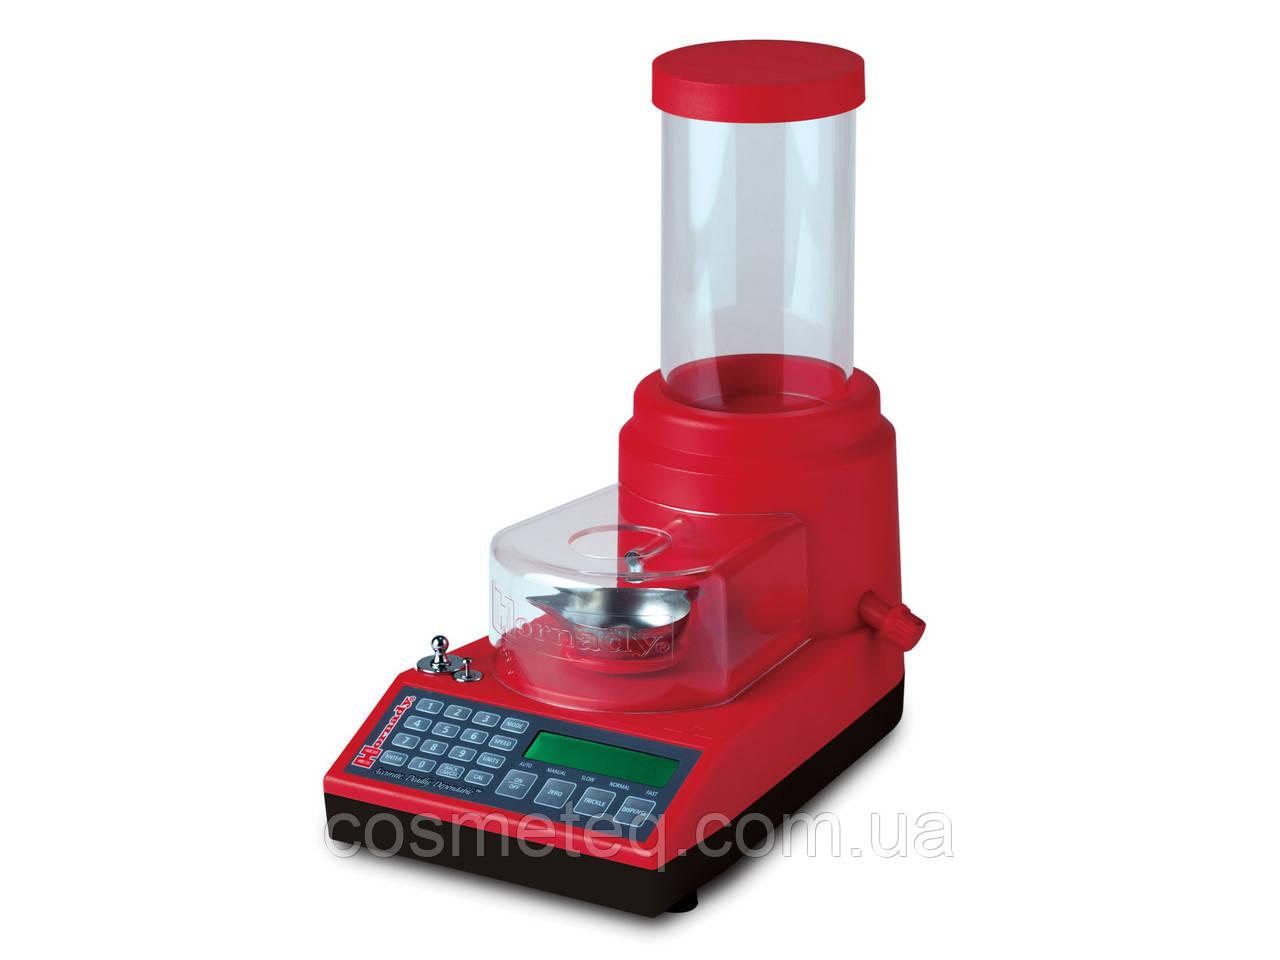 Охотничьи весы дозатор для пороха Hornady Lock-N-Load Auto Charge Powder Scale and Dispenser 110/220 Volt